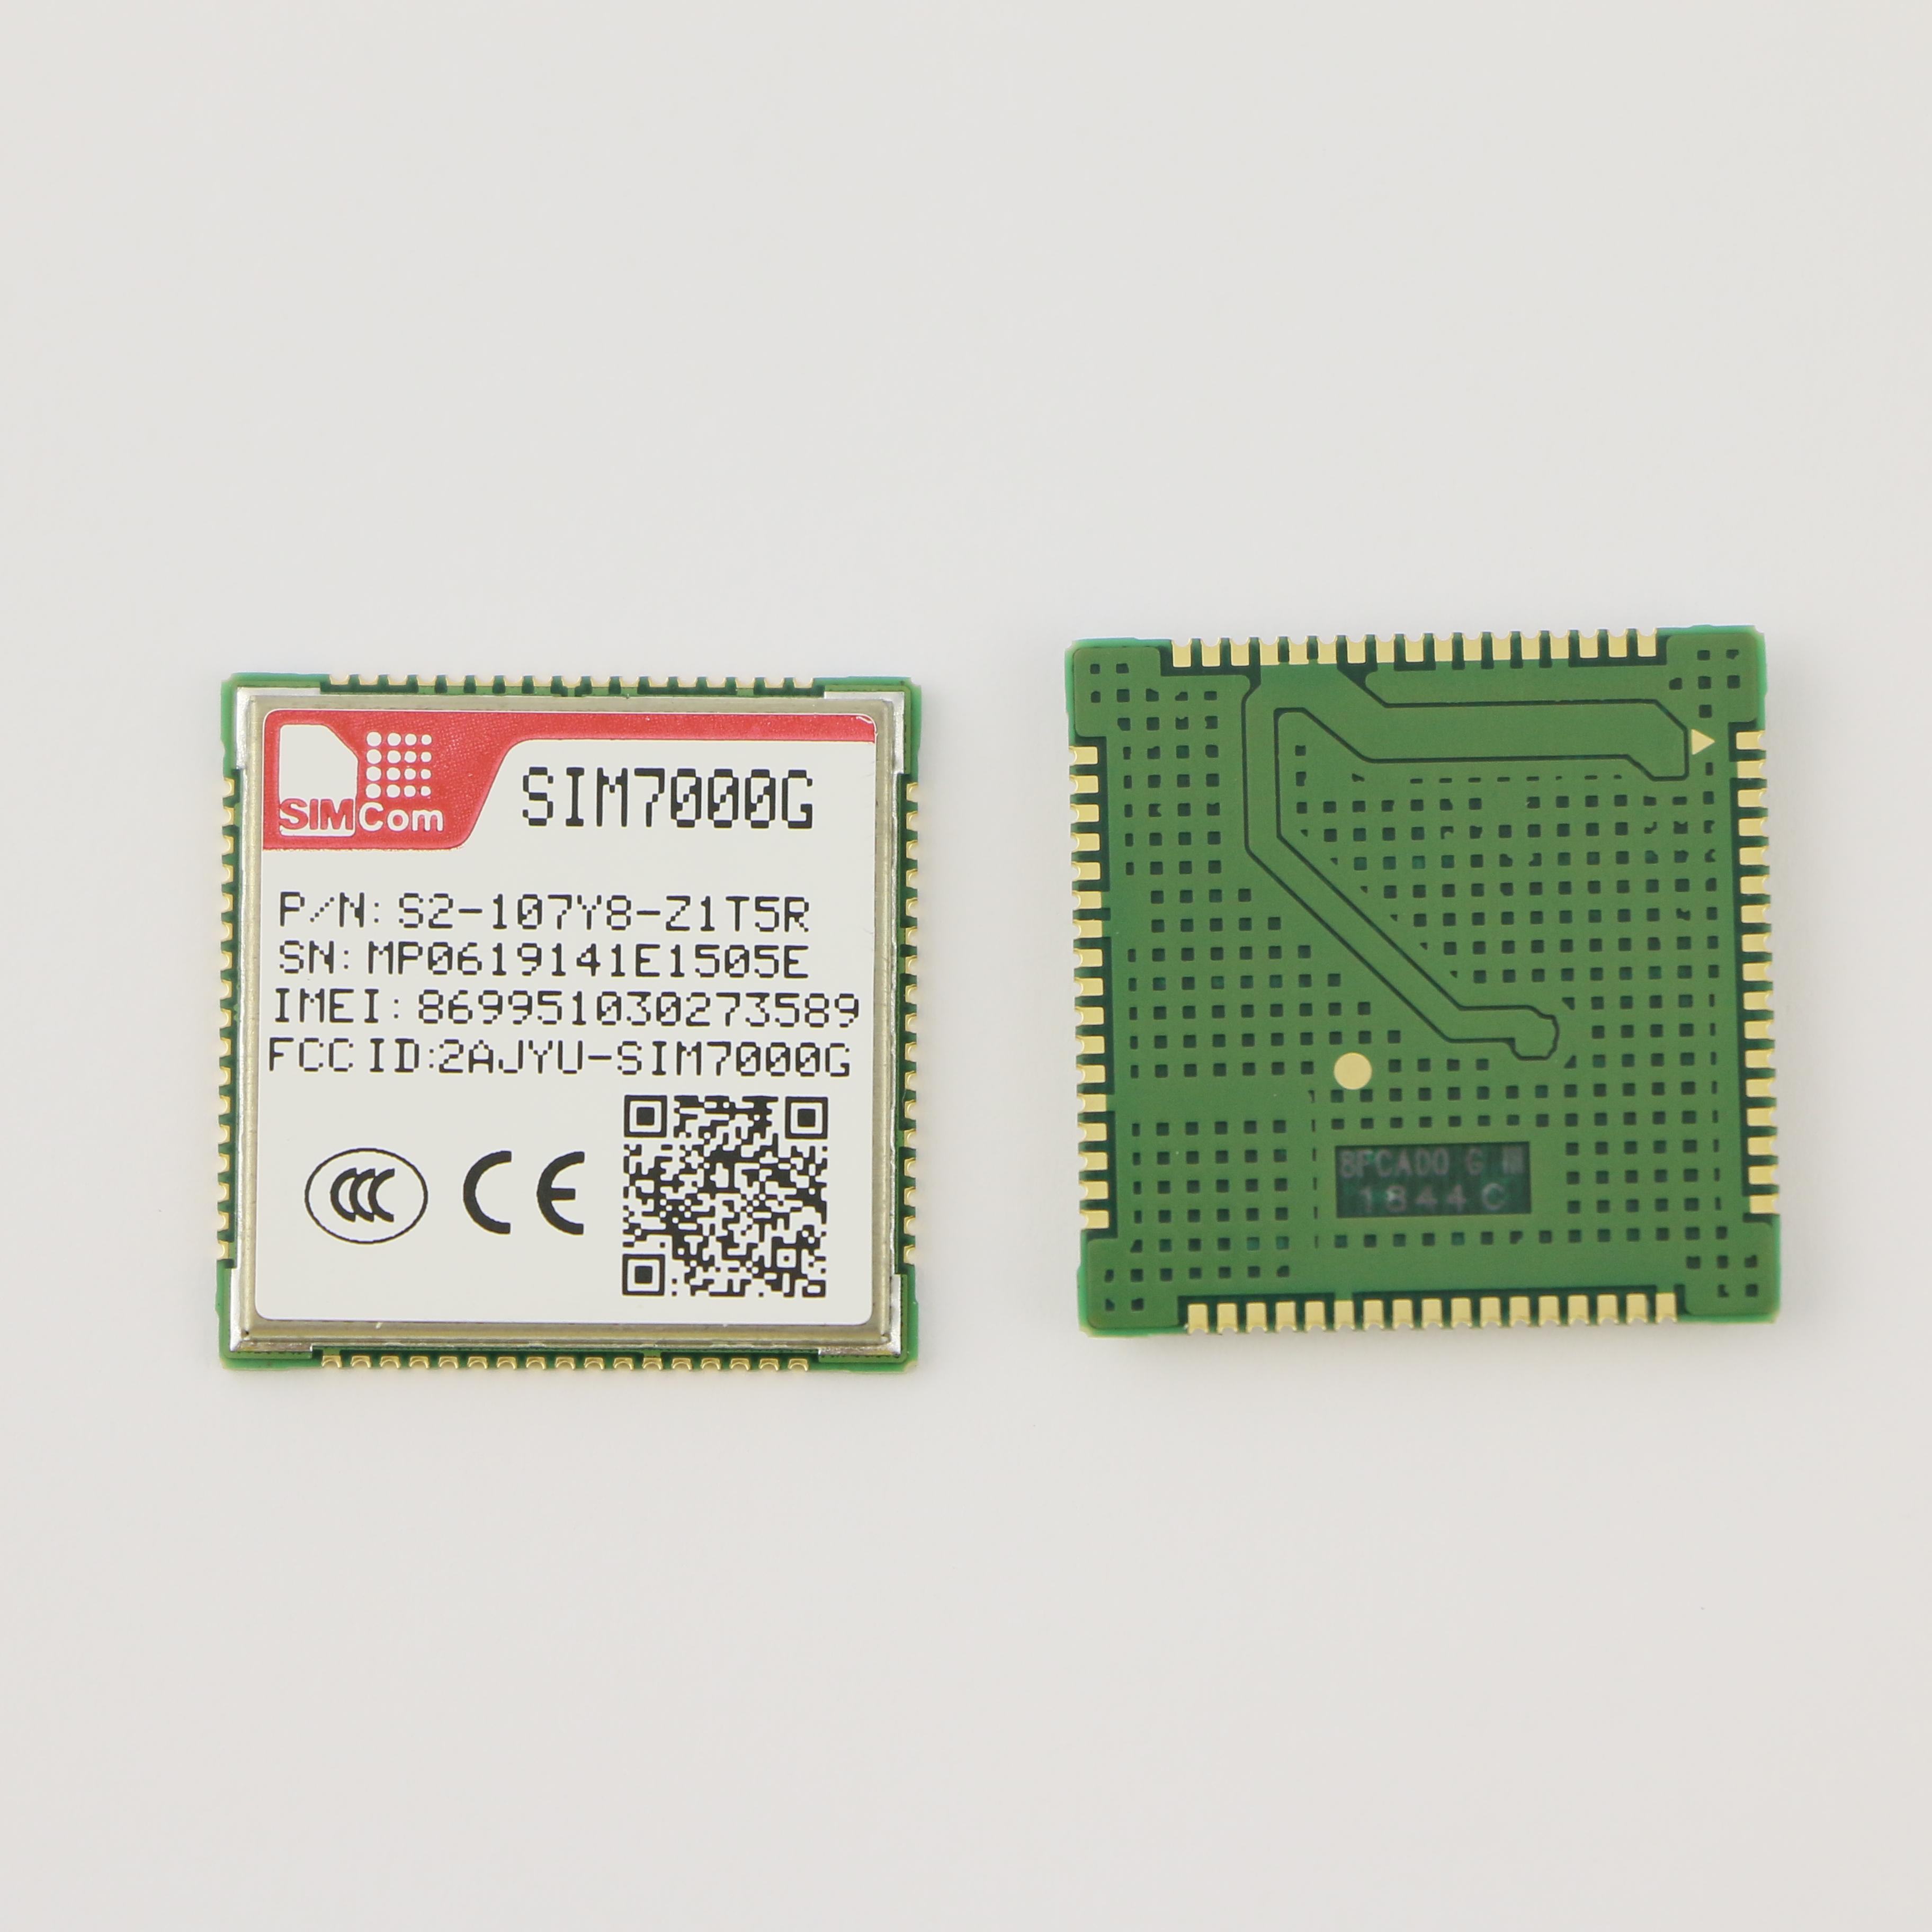 eMTC/NB-IoT/EDGE Module LTE mdoule new and original SIMCOM module SIM7000G LCC Globally used